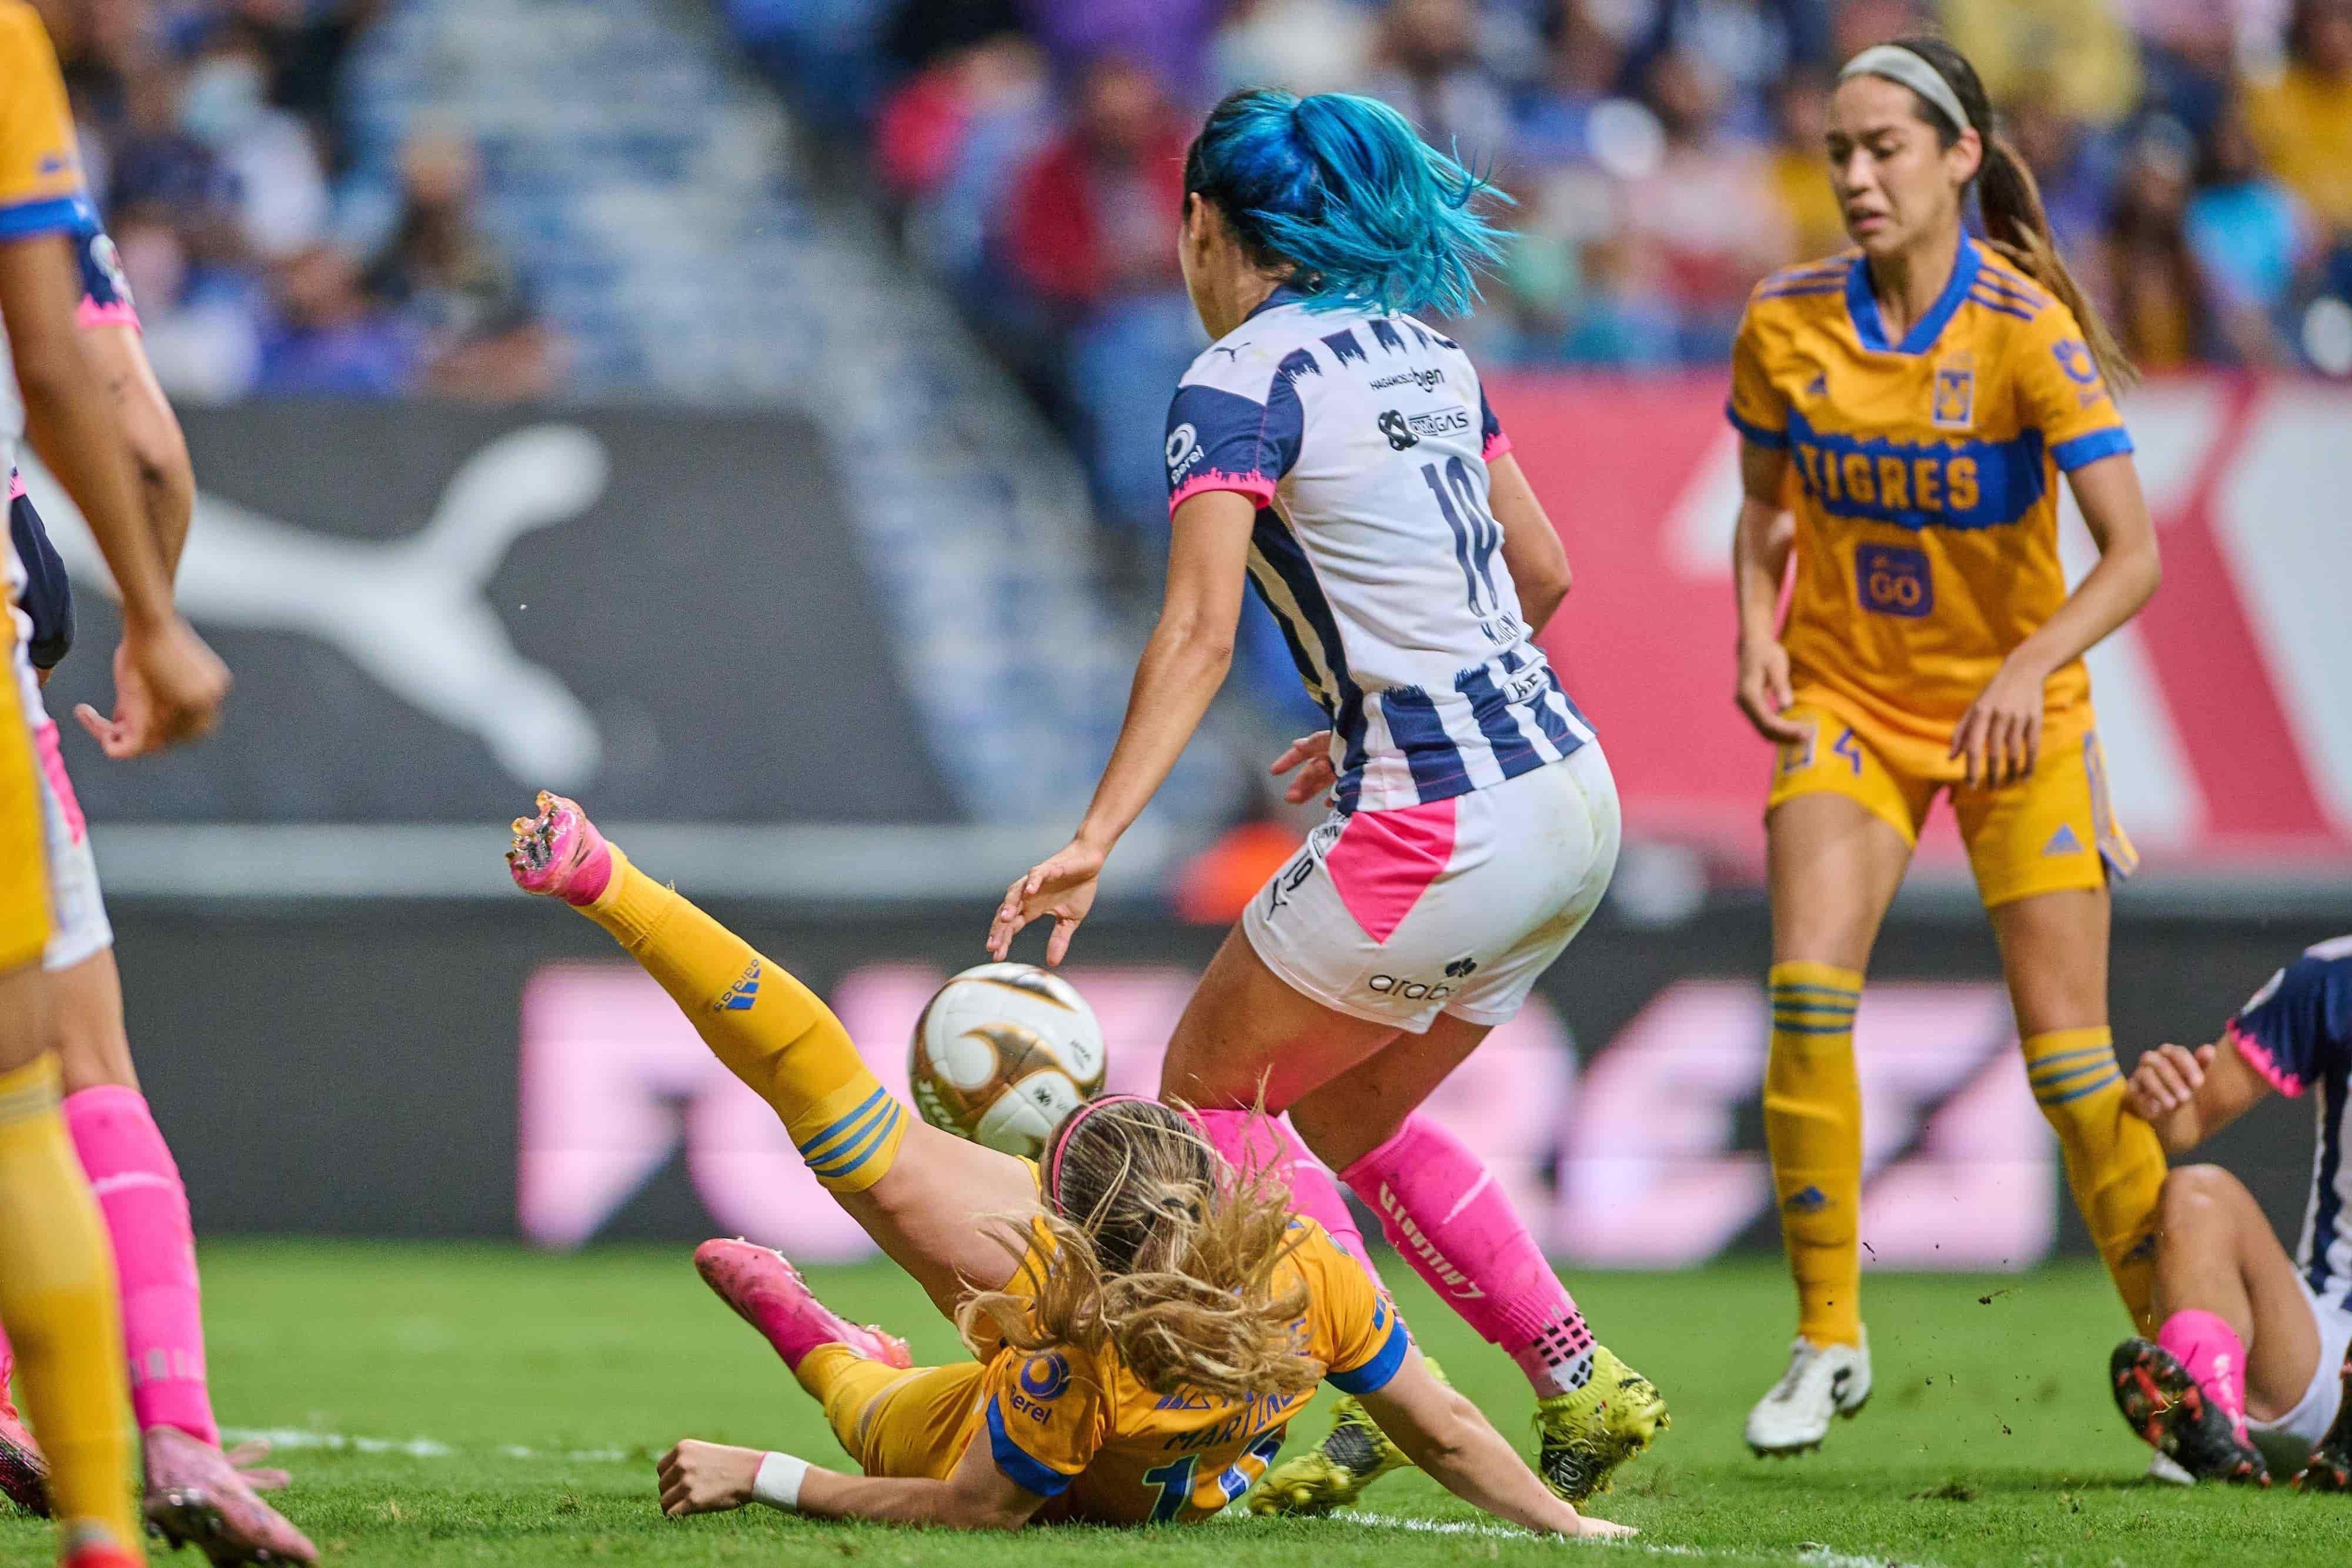 Monterrey 2-2 Tigres